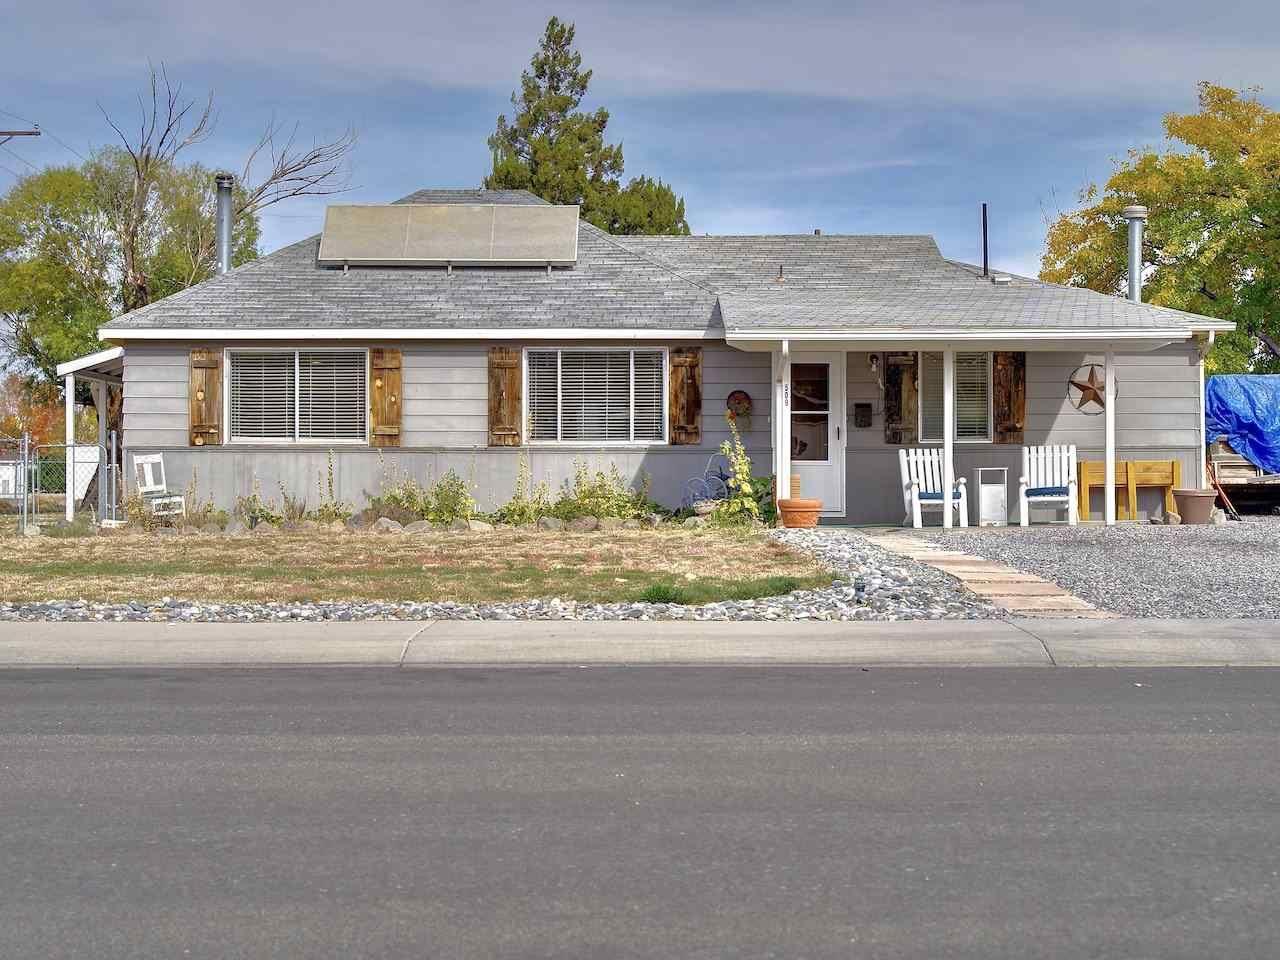 Photo of 509 Beech Avenue, Fruita, CO 81521 (MLS # 20205223)